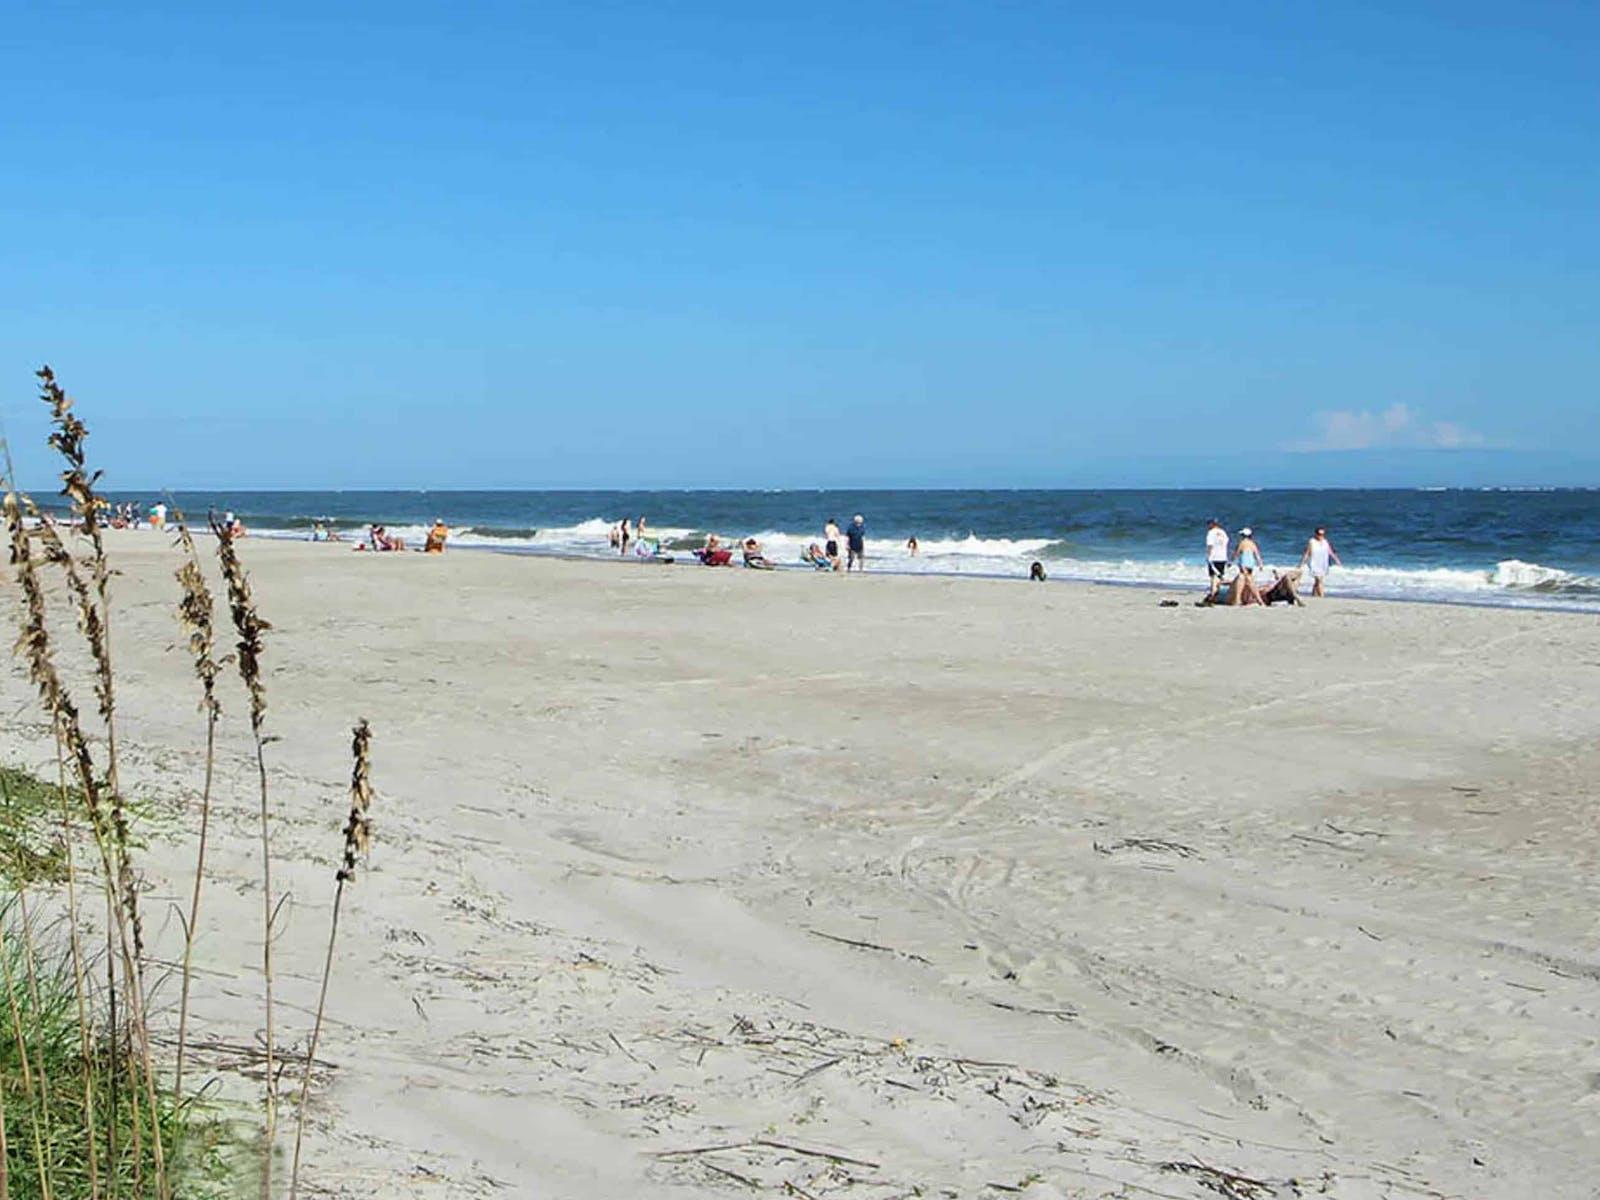 Beachgoers enjoying the beach on Hilton Head Island